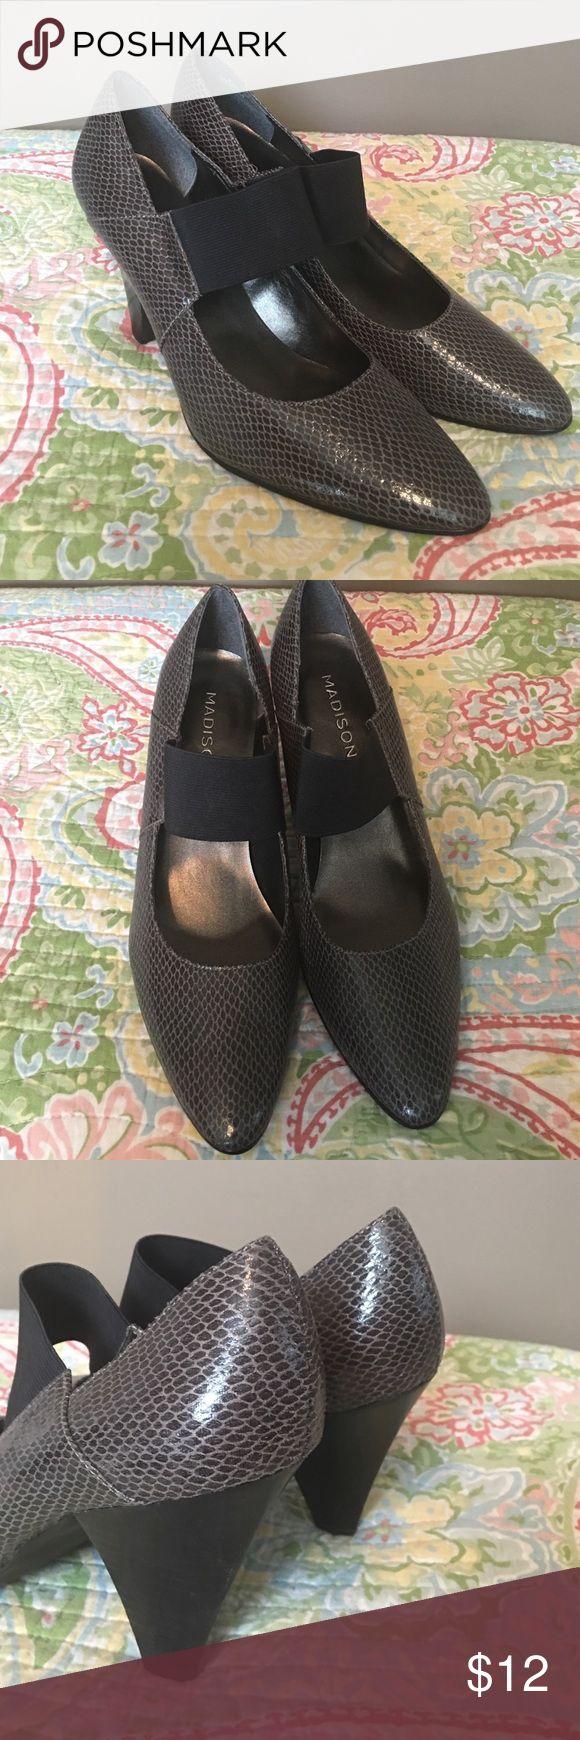 "Madison gray pumps. EUC. Sz 8.5 Beautiful gray pumps. Sz 8.5. EUC. 3.5"" heel. Madison Shoes Heels"